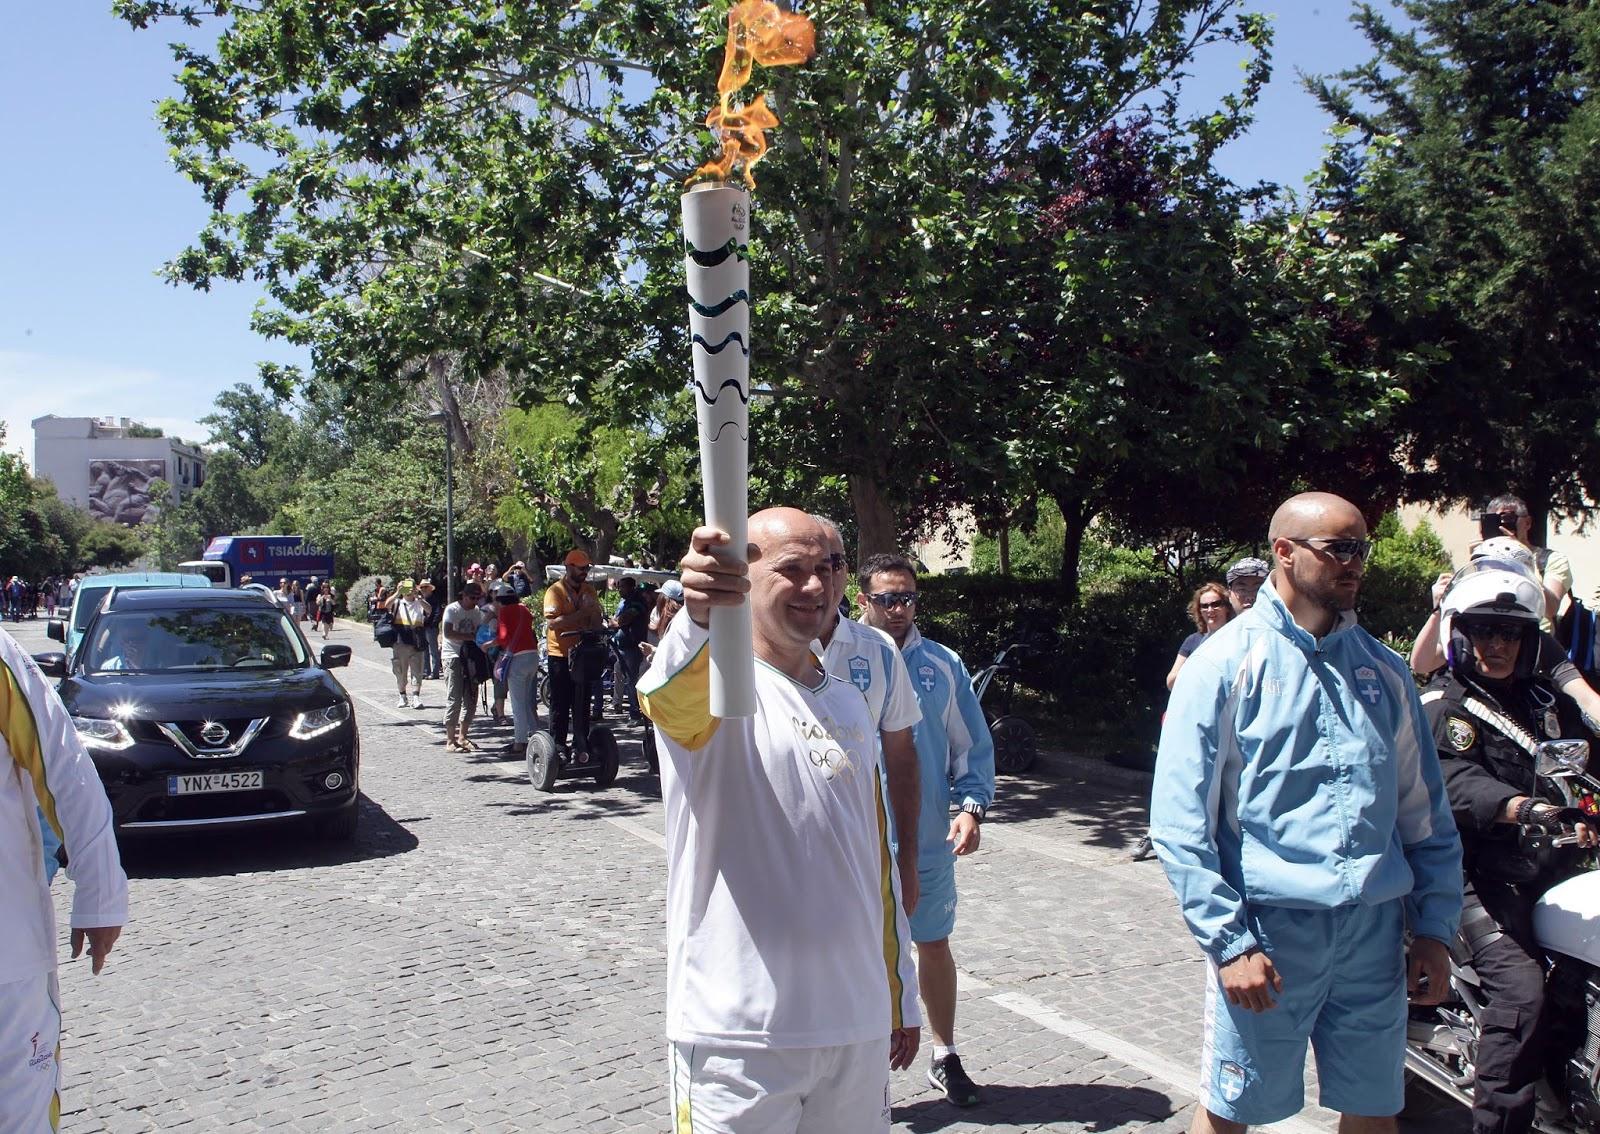 IMG 3900 O Αντιπρόεδρος Πωλήσεων και Μάρκετινγκ της Nissan Europe Guillaume Cartier, λαμπαδηδρόμος της Ολυμπιακής Φλόγας στην Αθήνα Nissan, Ολυμπιακοί αγώνες